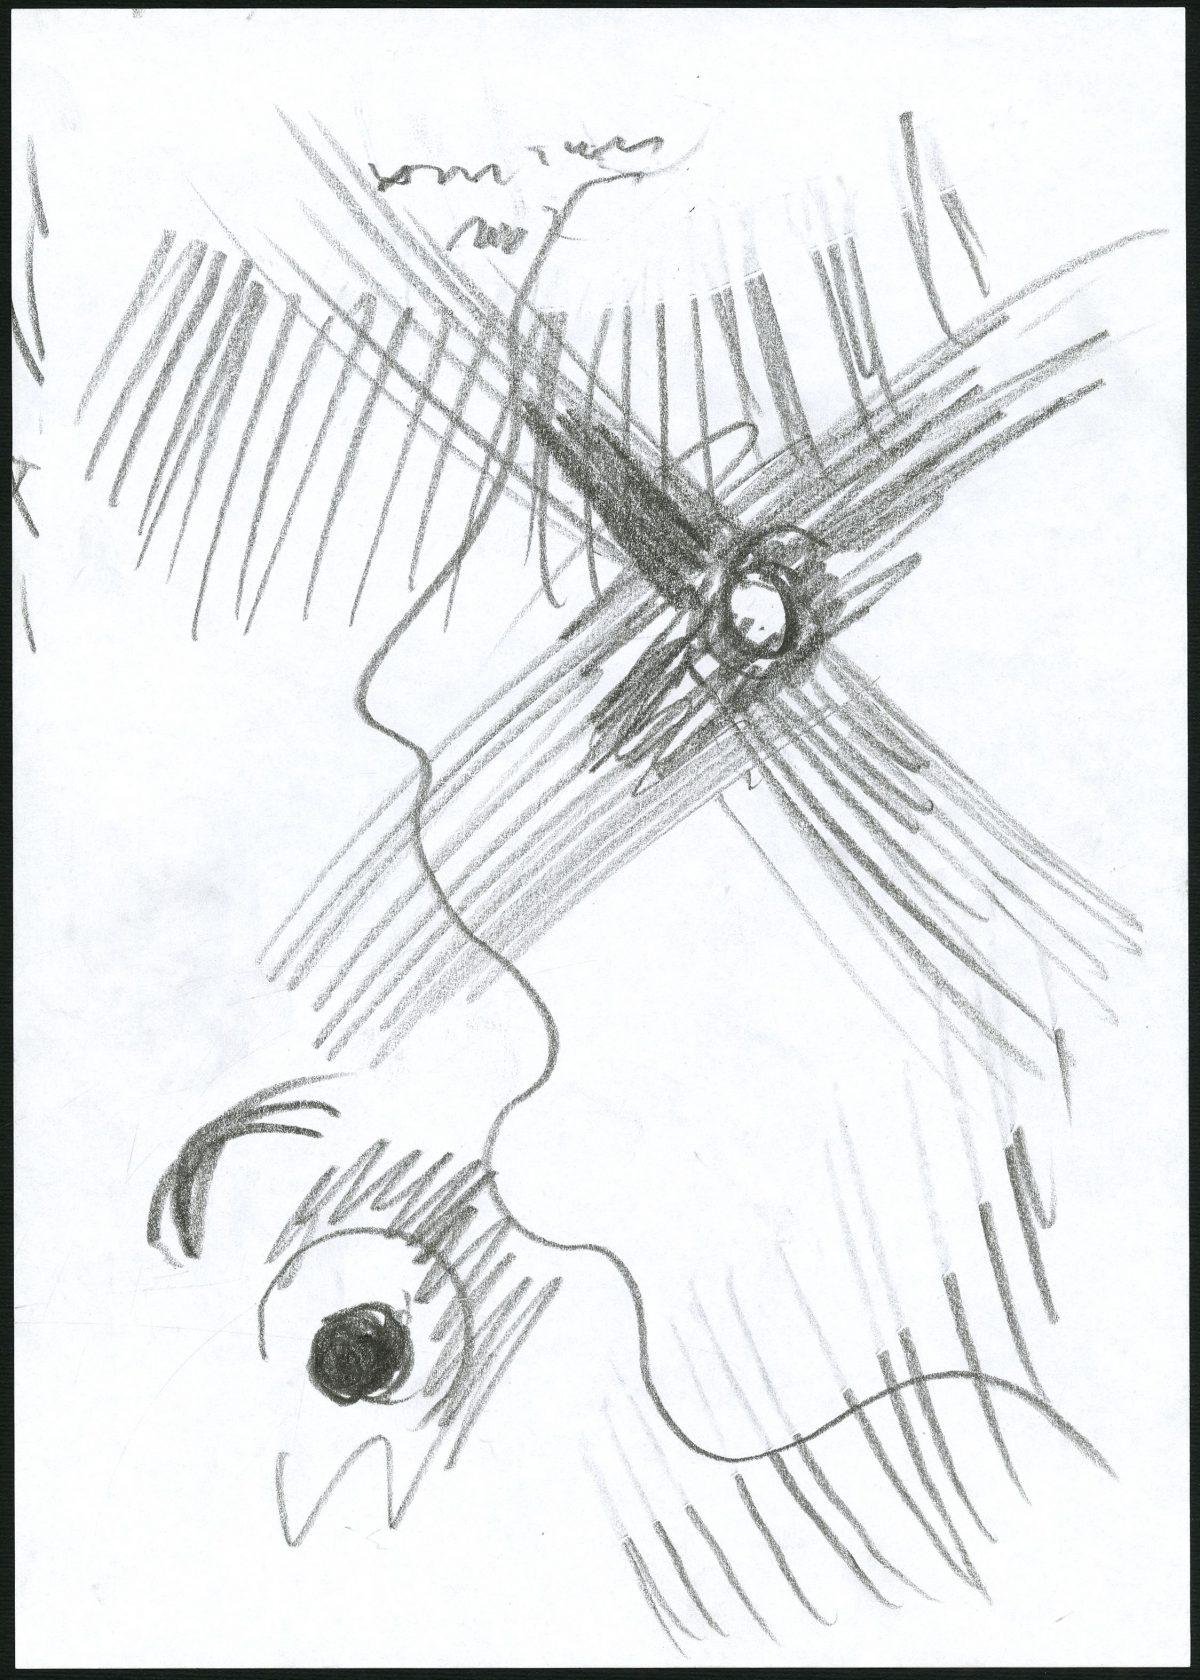 G26693(101)<br/> <b>Cím:</b> Ezt már láttam, már hallottam <br/> <b>Méret cm:</b> 29,8x21 <br/> <b>Készült:</b> 2007. <br/> <b>Technika:</b> ceruza<br/>